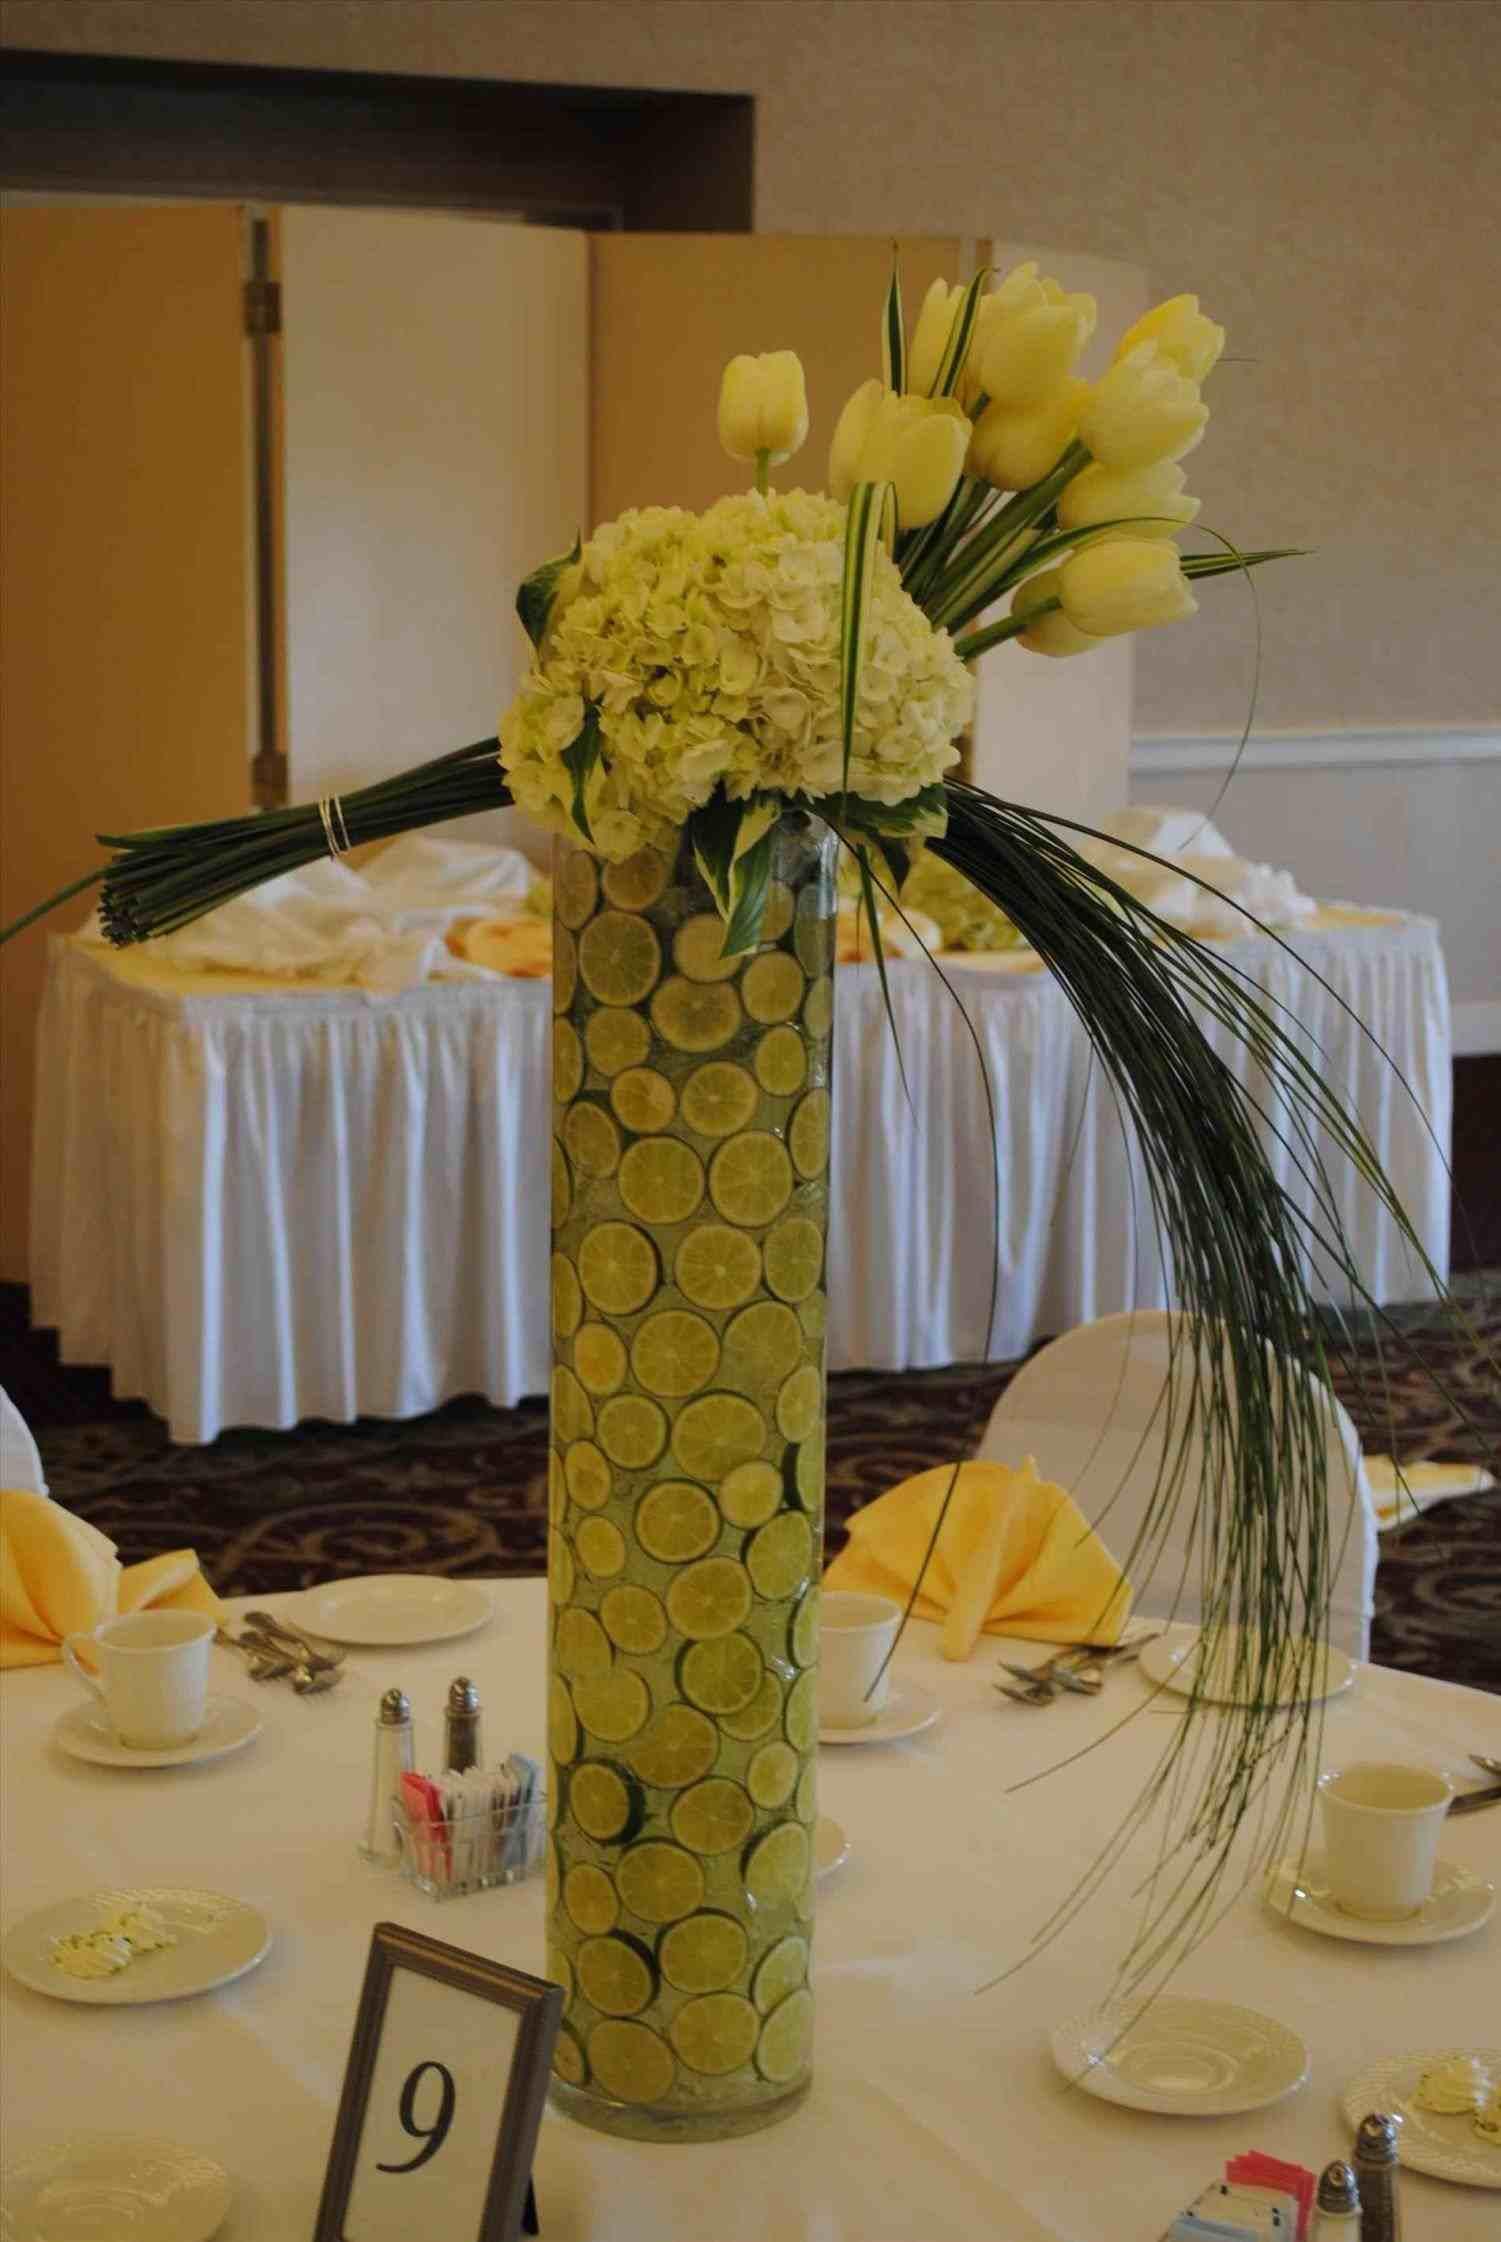 Best ideas about DIY Wedding Centerpieces Without Flowers . Save or Pin spring centerpieces without flowers ARCH DSGN Now.